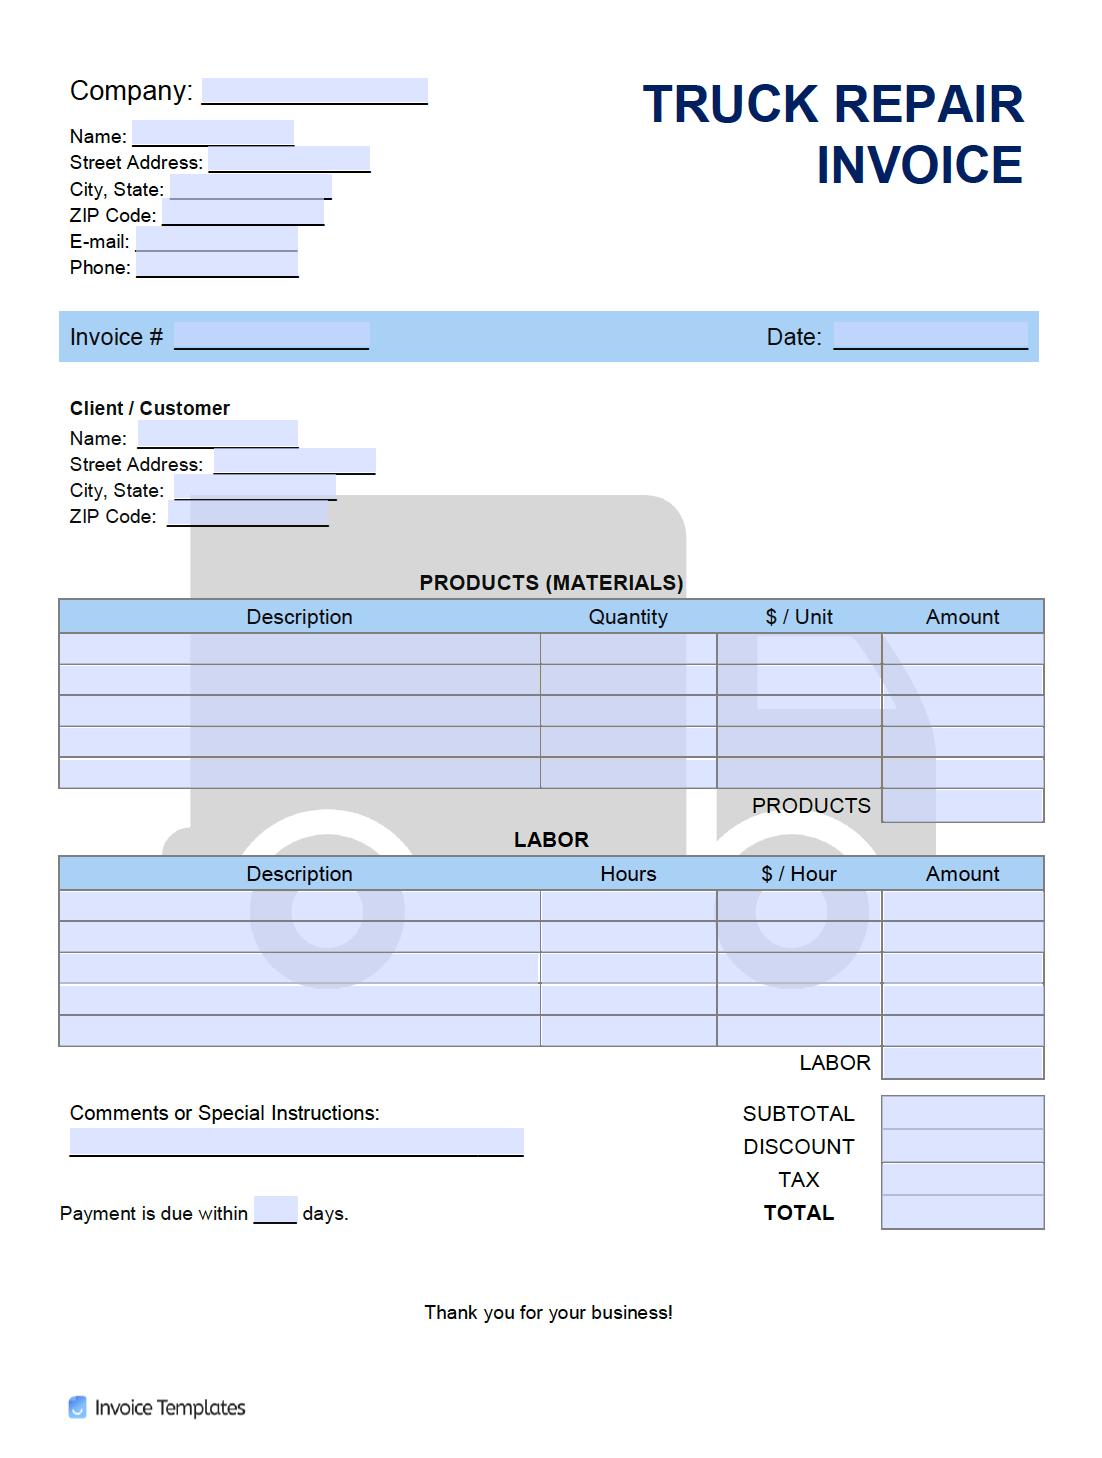 Free Truck Repair Invoice Template Pdf Word Excel